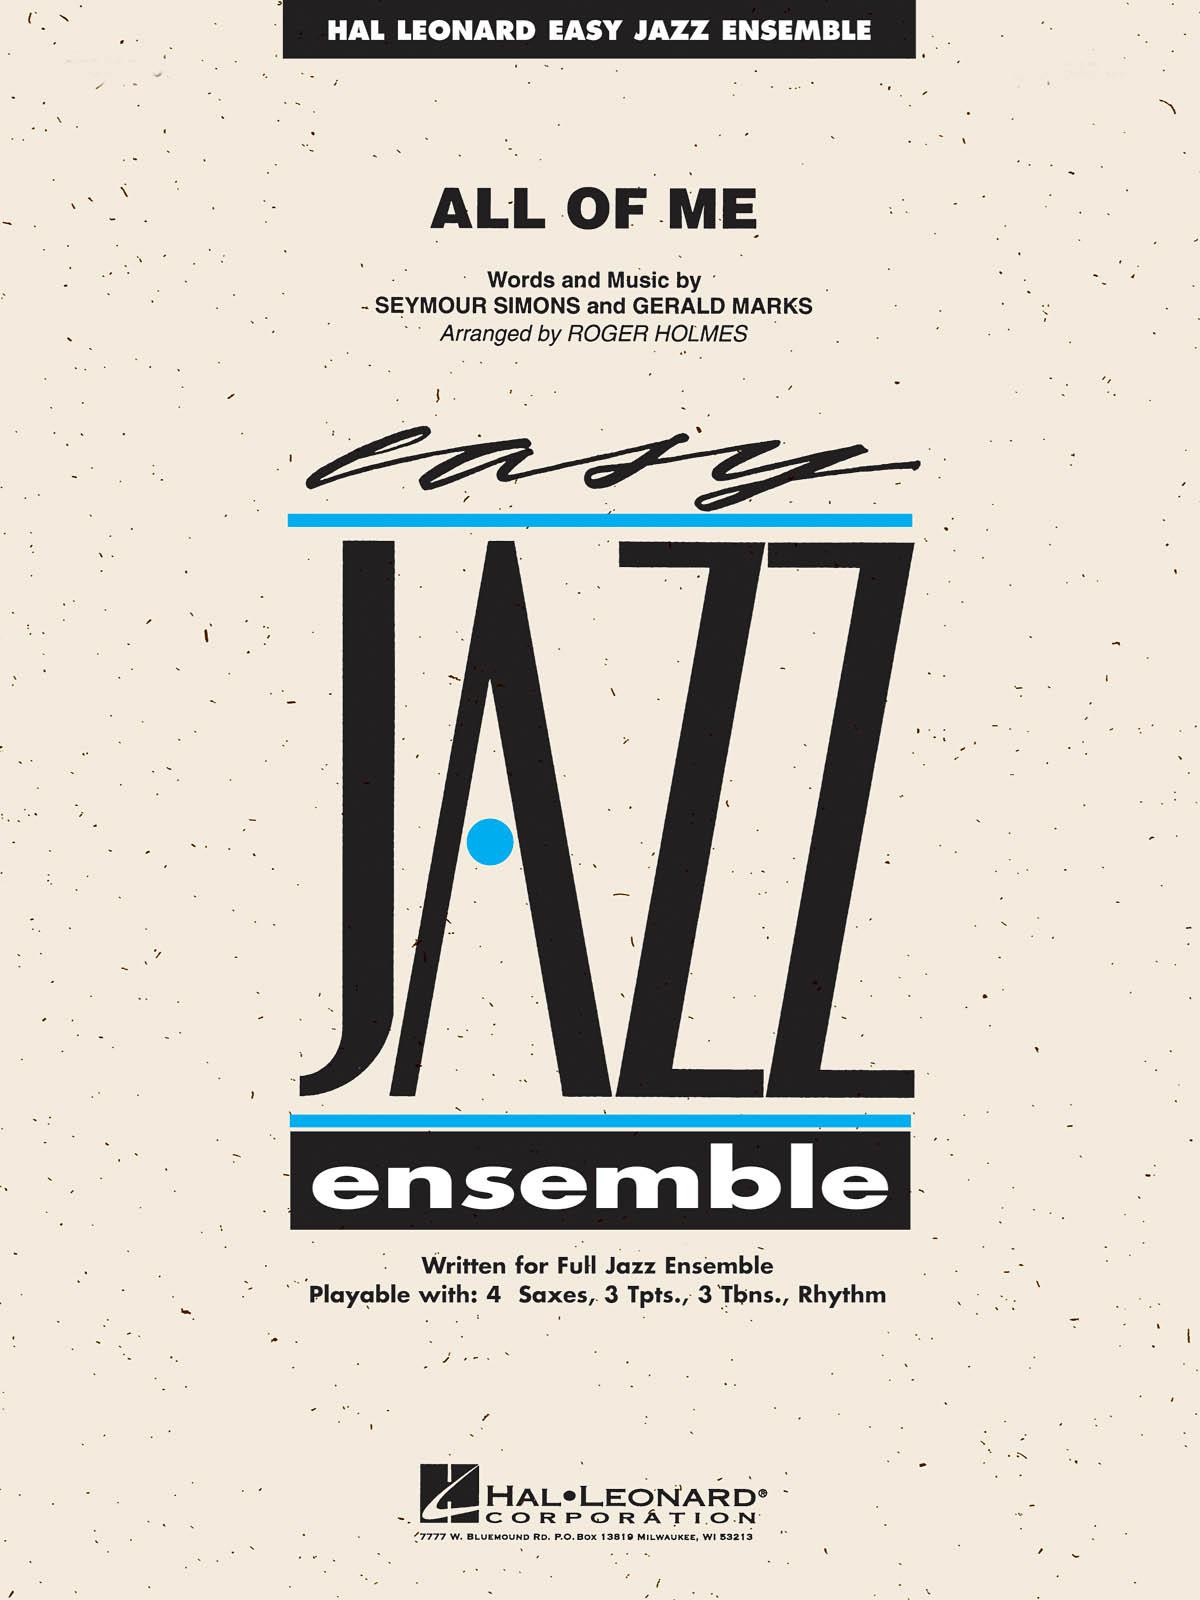 Gerald Marks Seymour Simons: All of Me: Jazz Ensemble: Score  Parts & Audio